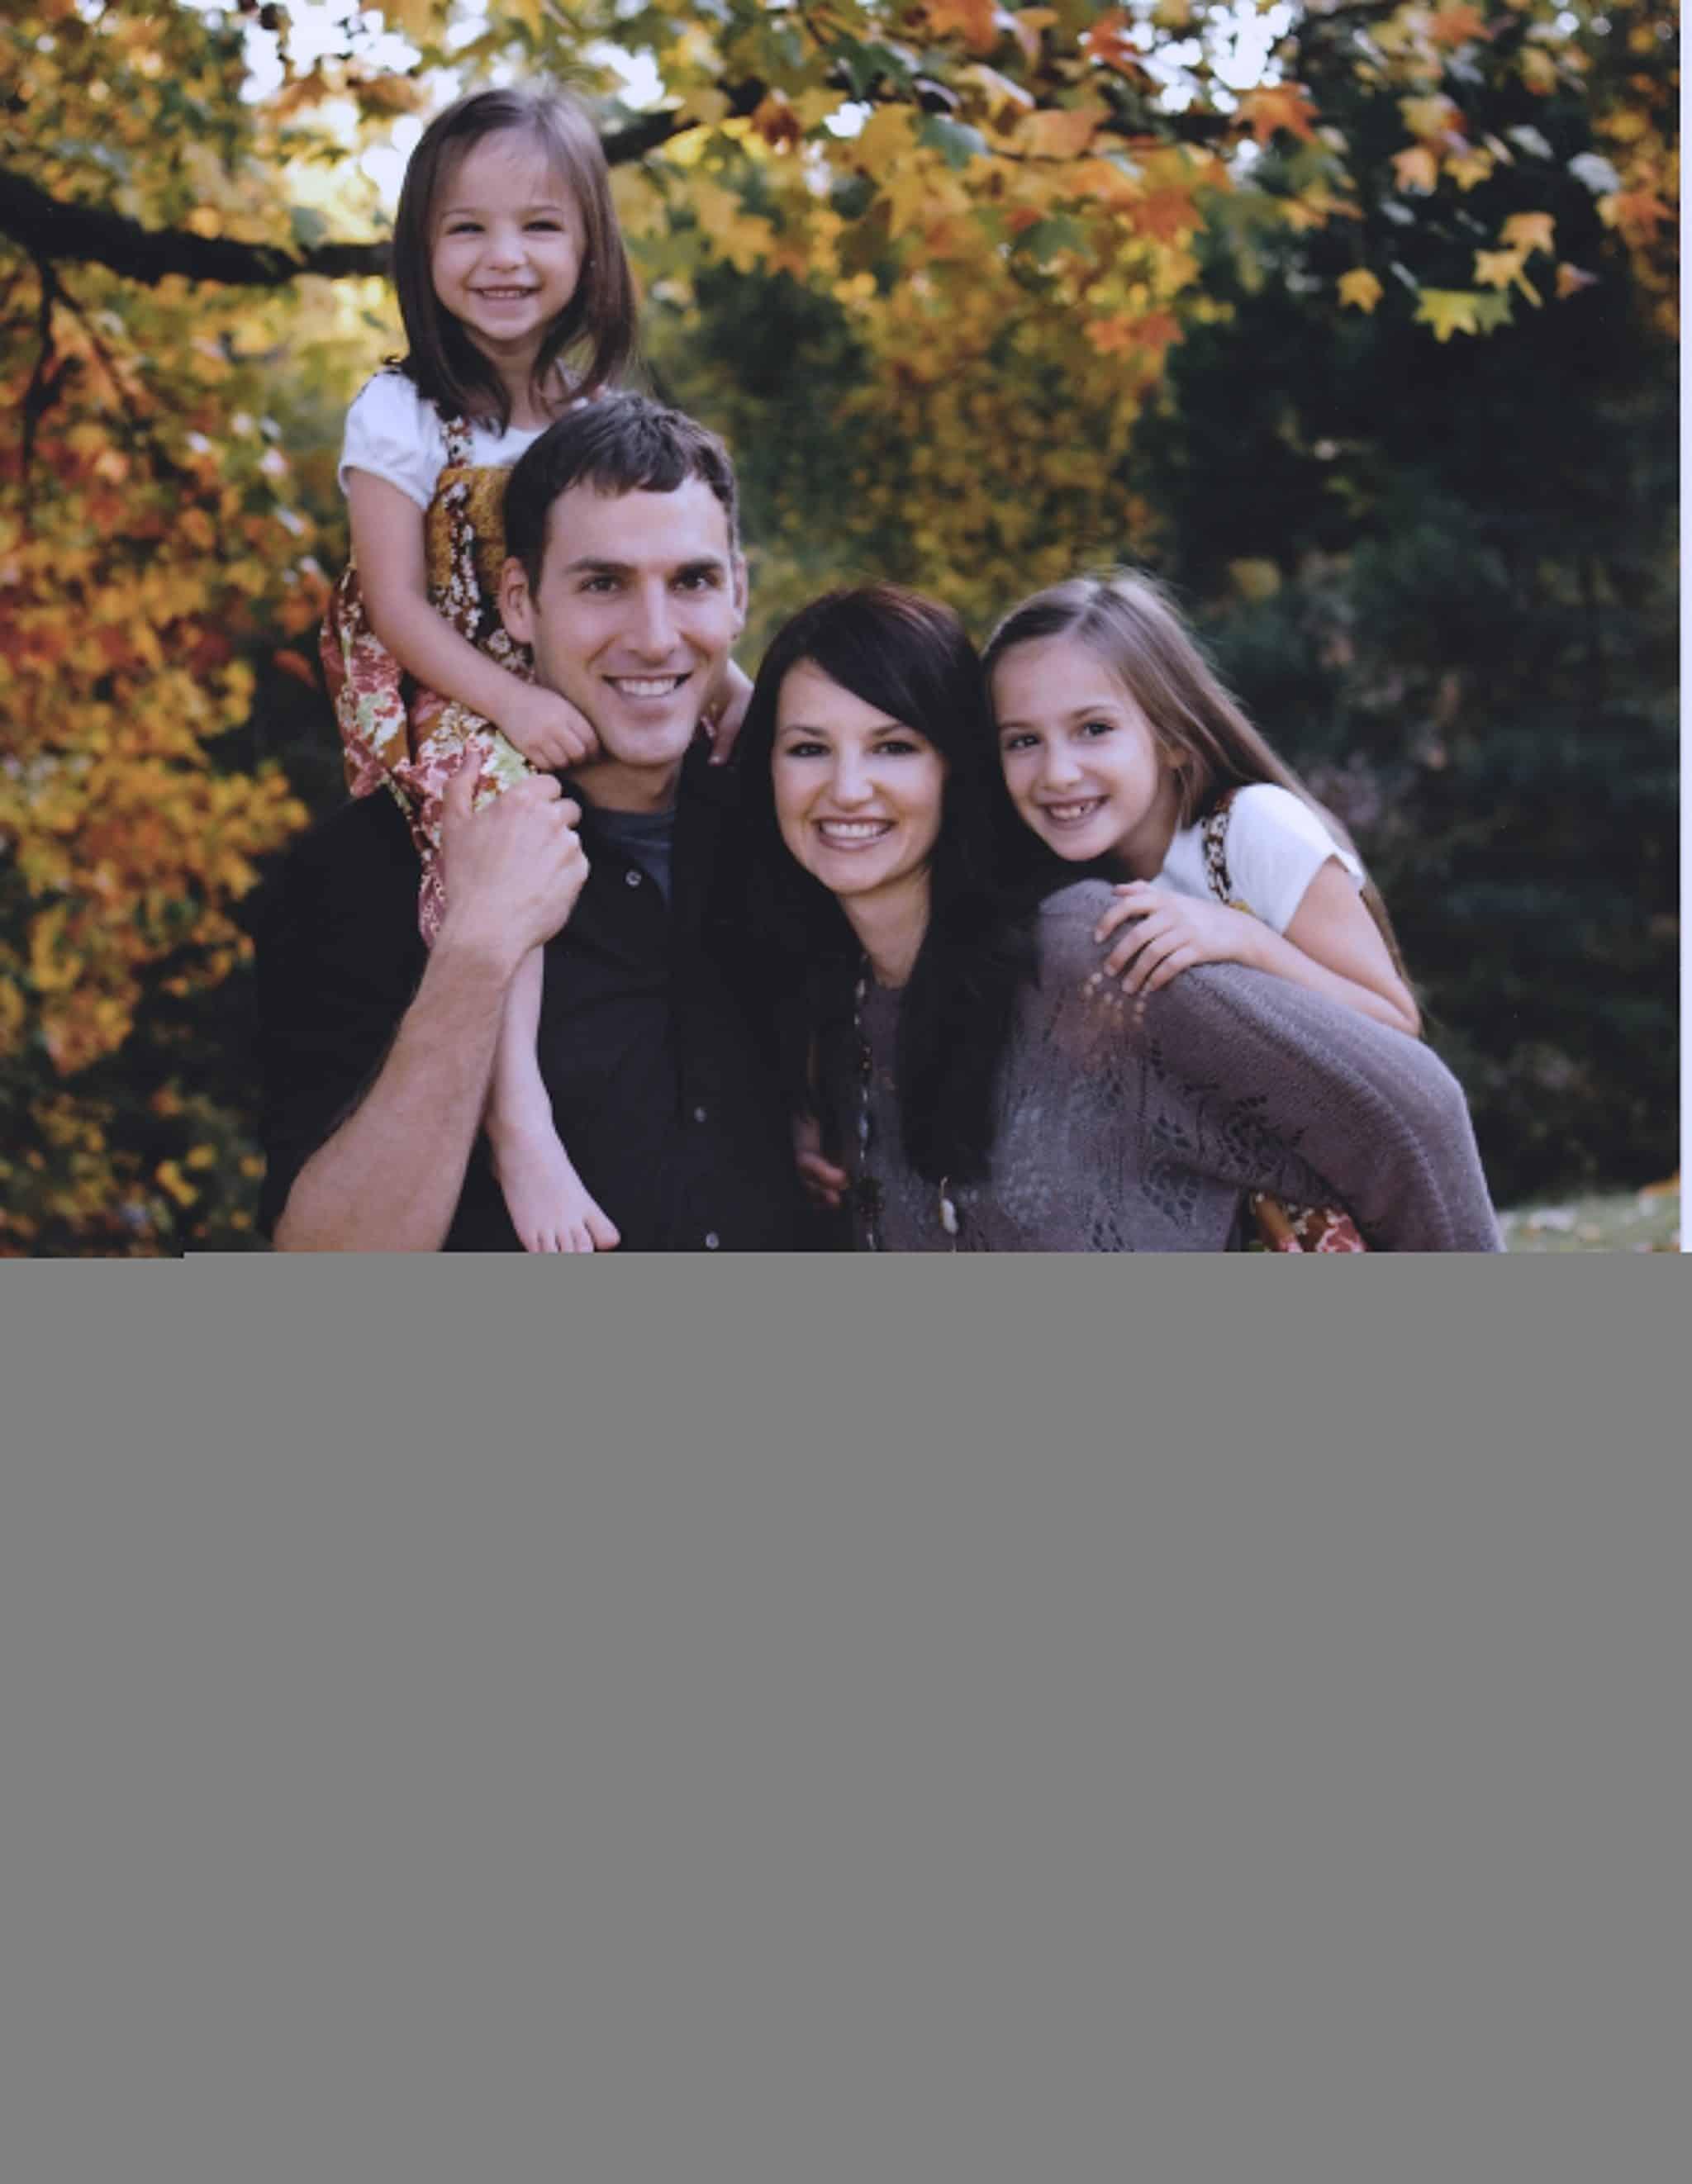 Wark Family Photo 2012 scan 2